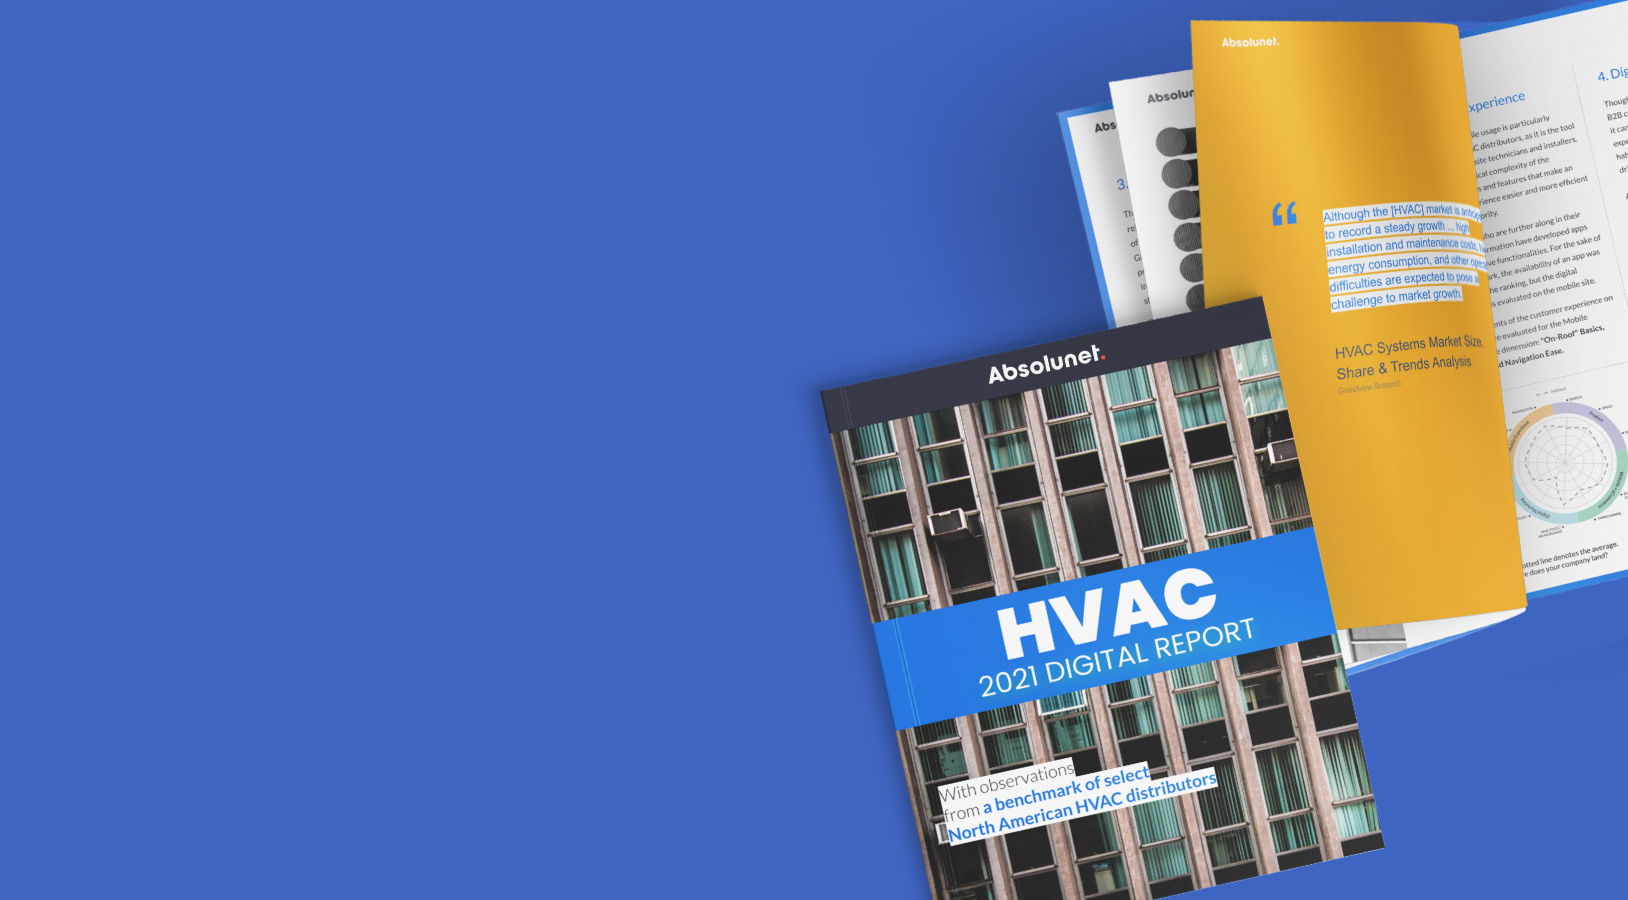 HVAC-Digital-Report-Header-Caroussel